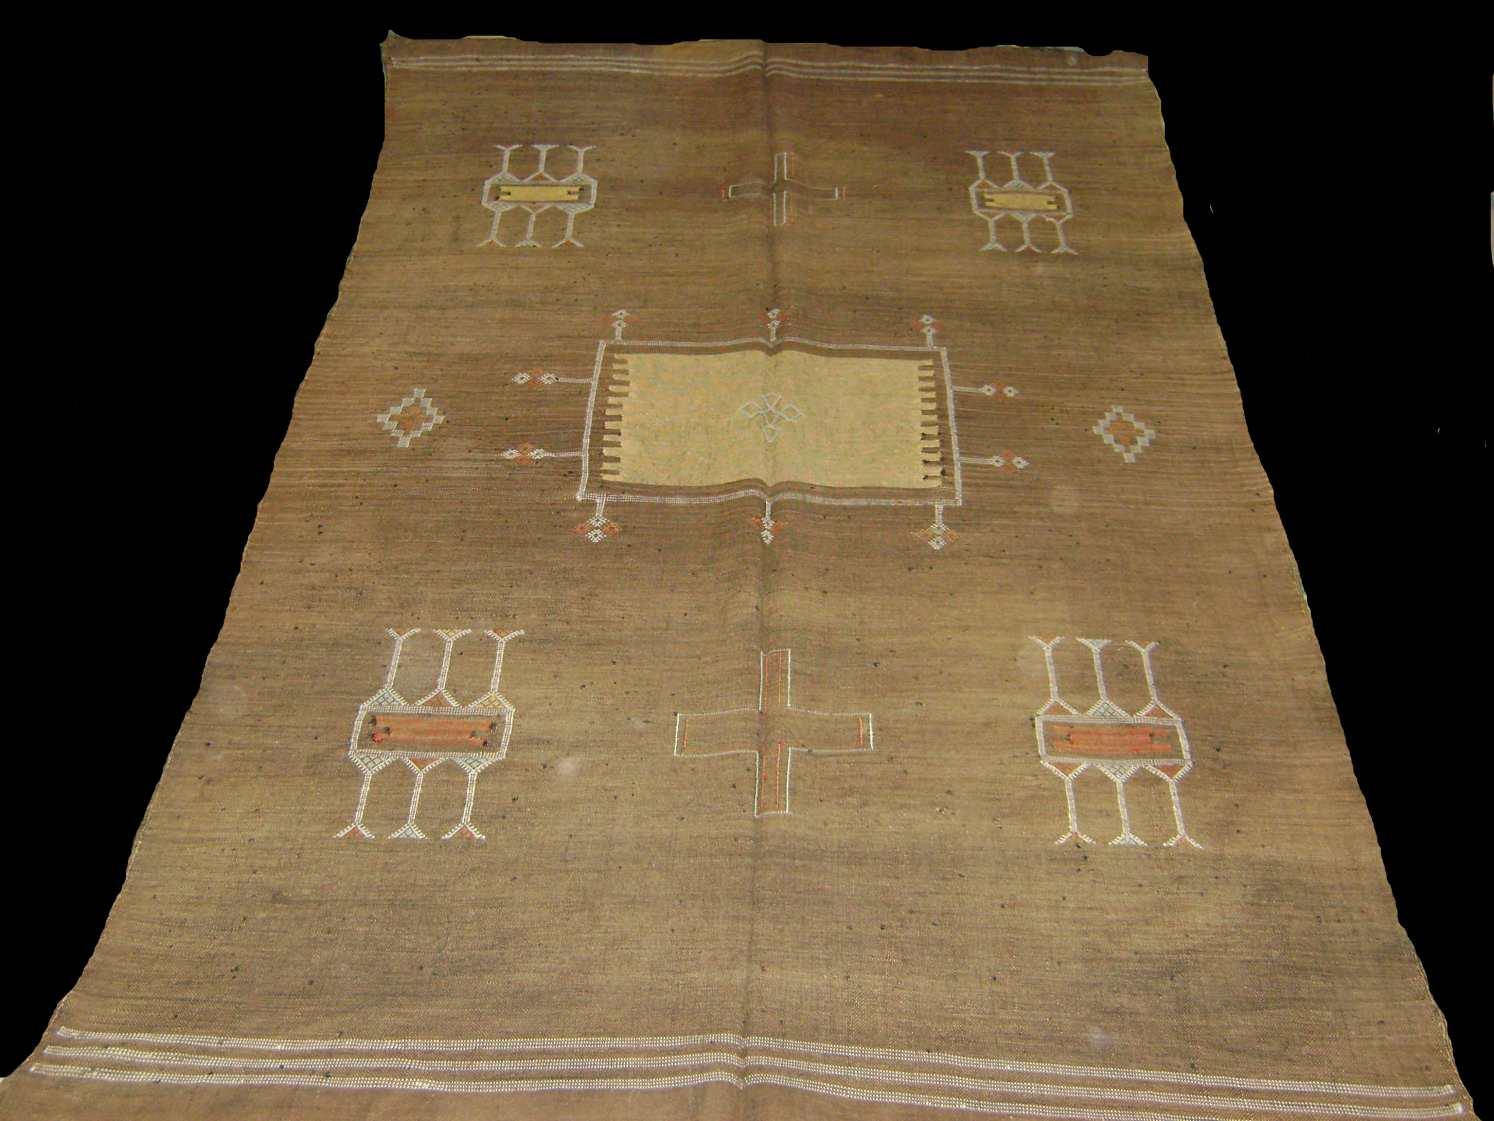 vente de tapis berberes fengshuihabitation. Black Bedroom Furniture Sets. Home Design Ideas